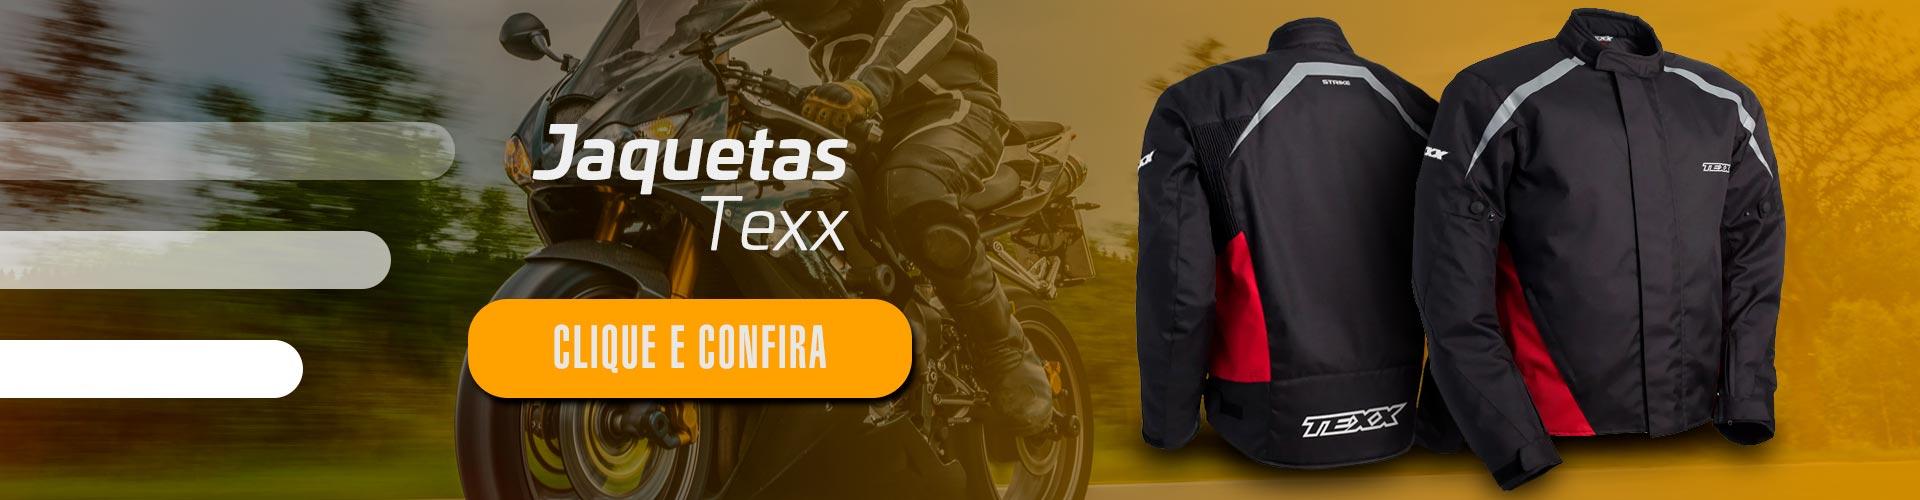 banner principal02 - Texx